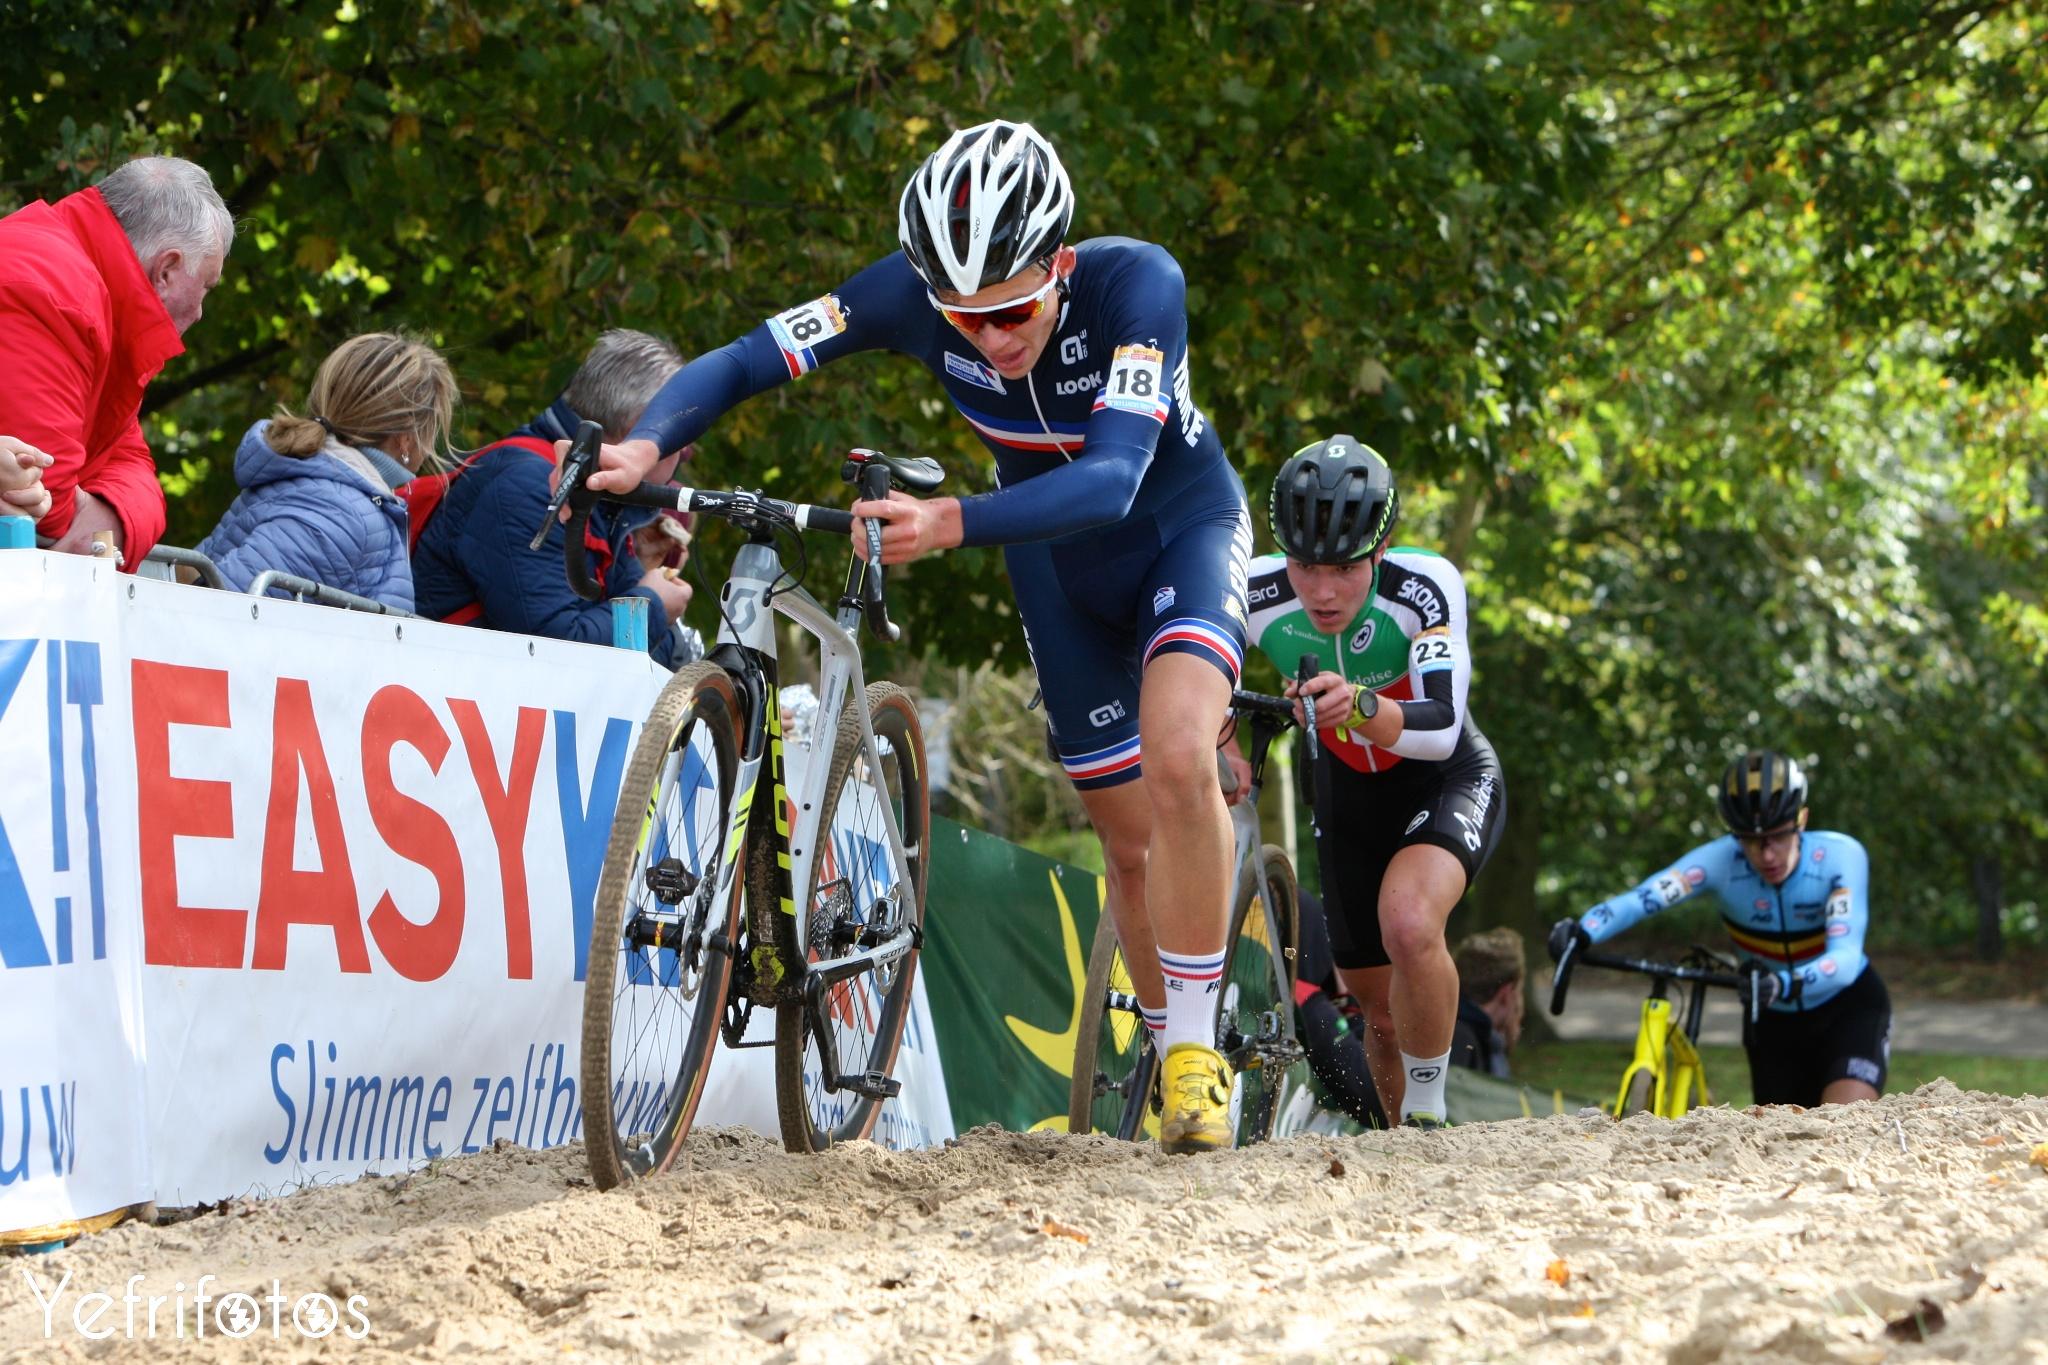 Koksijde - UCI Cyclocross World Cup - Eddy Finé